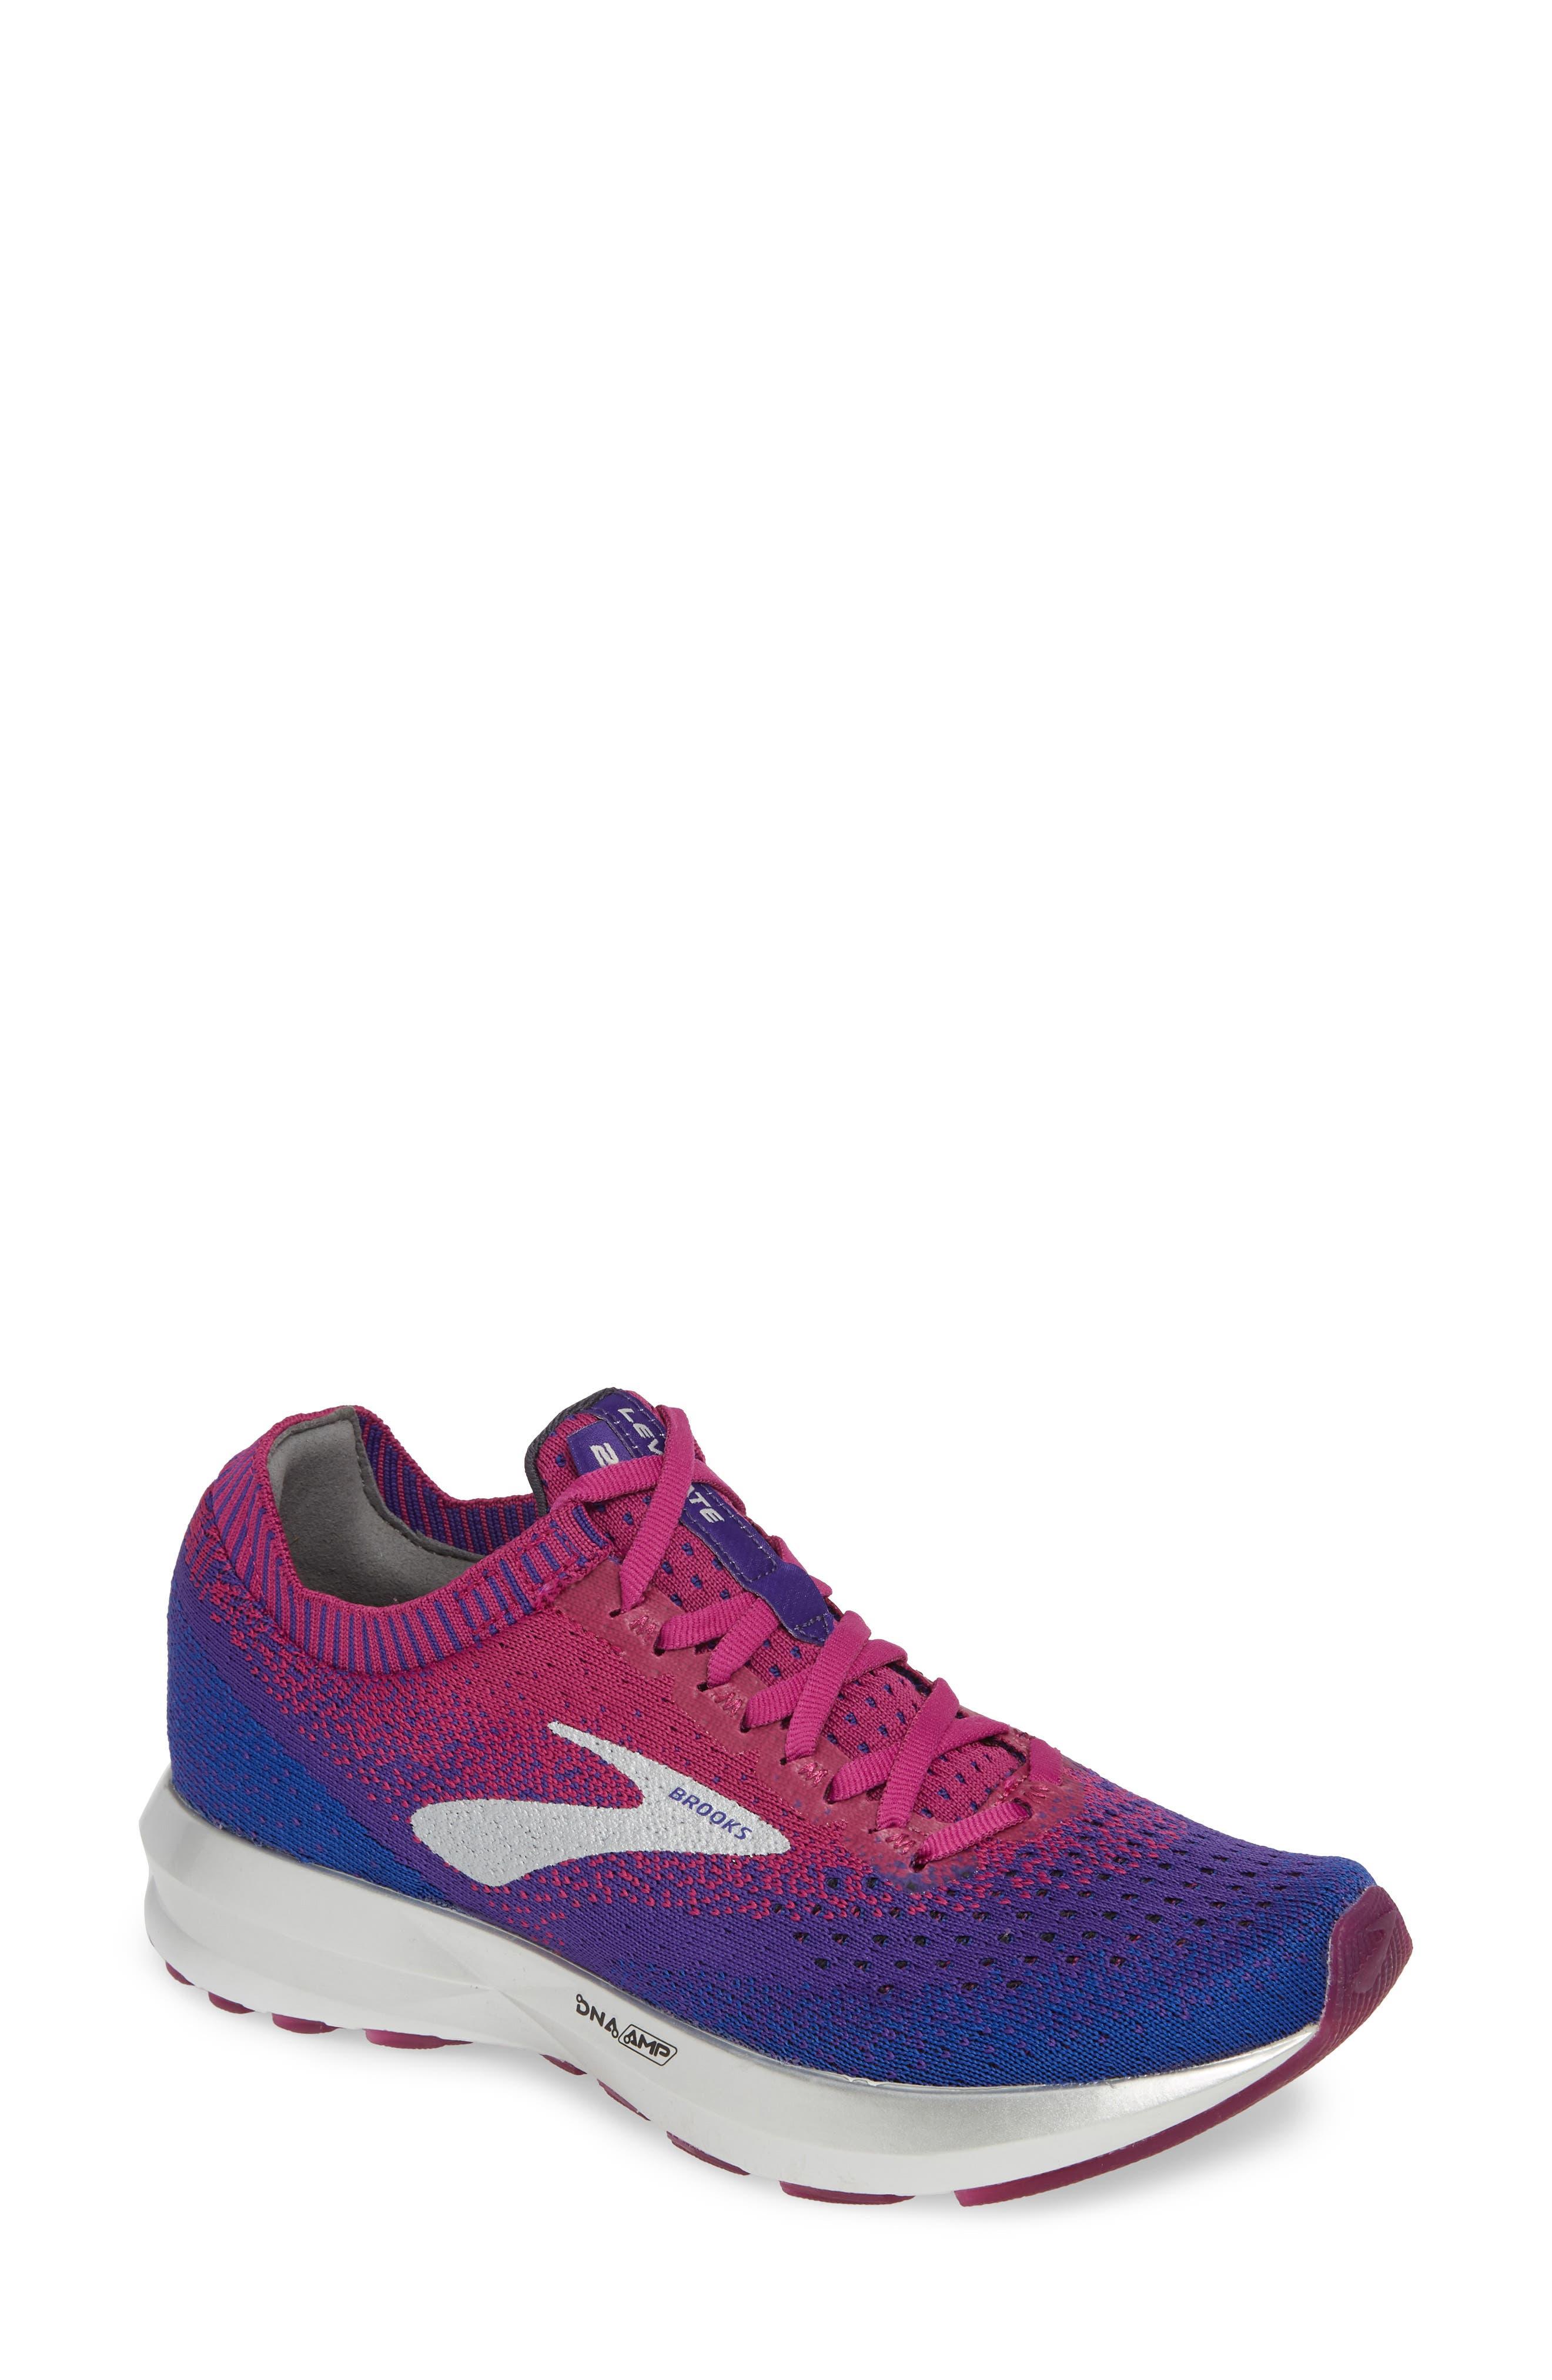 Brooks Levitate 2 Running Shoe, Purple